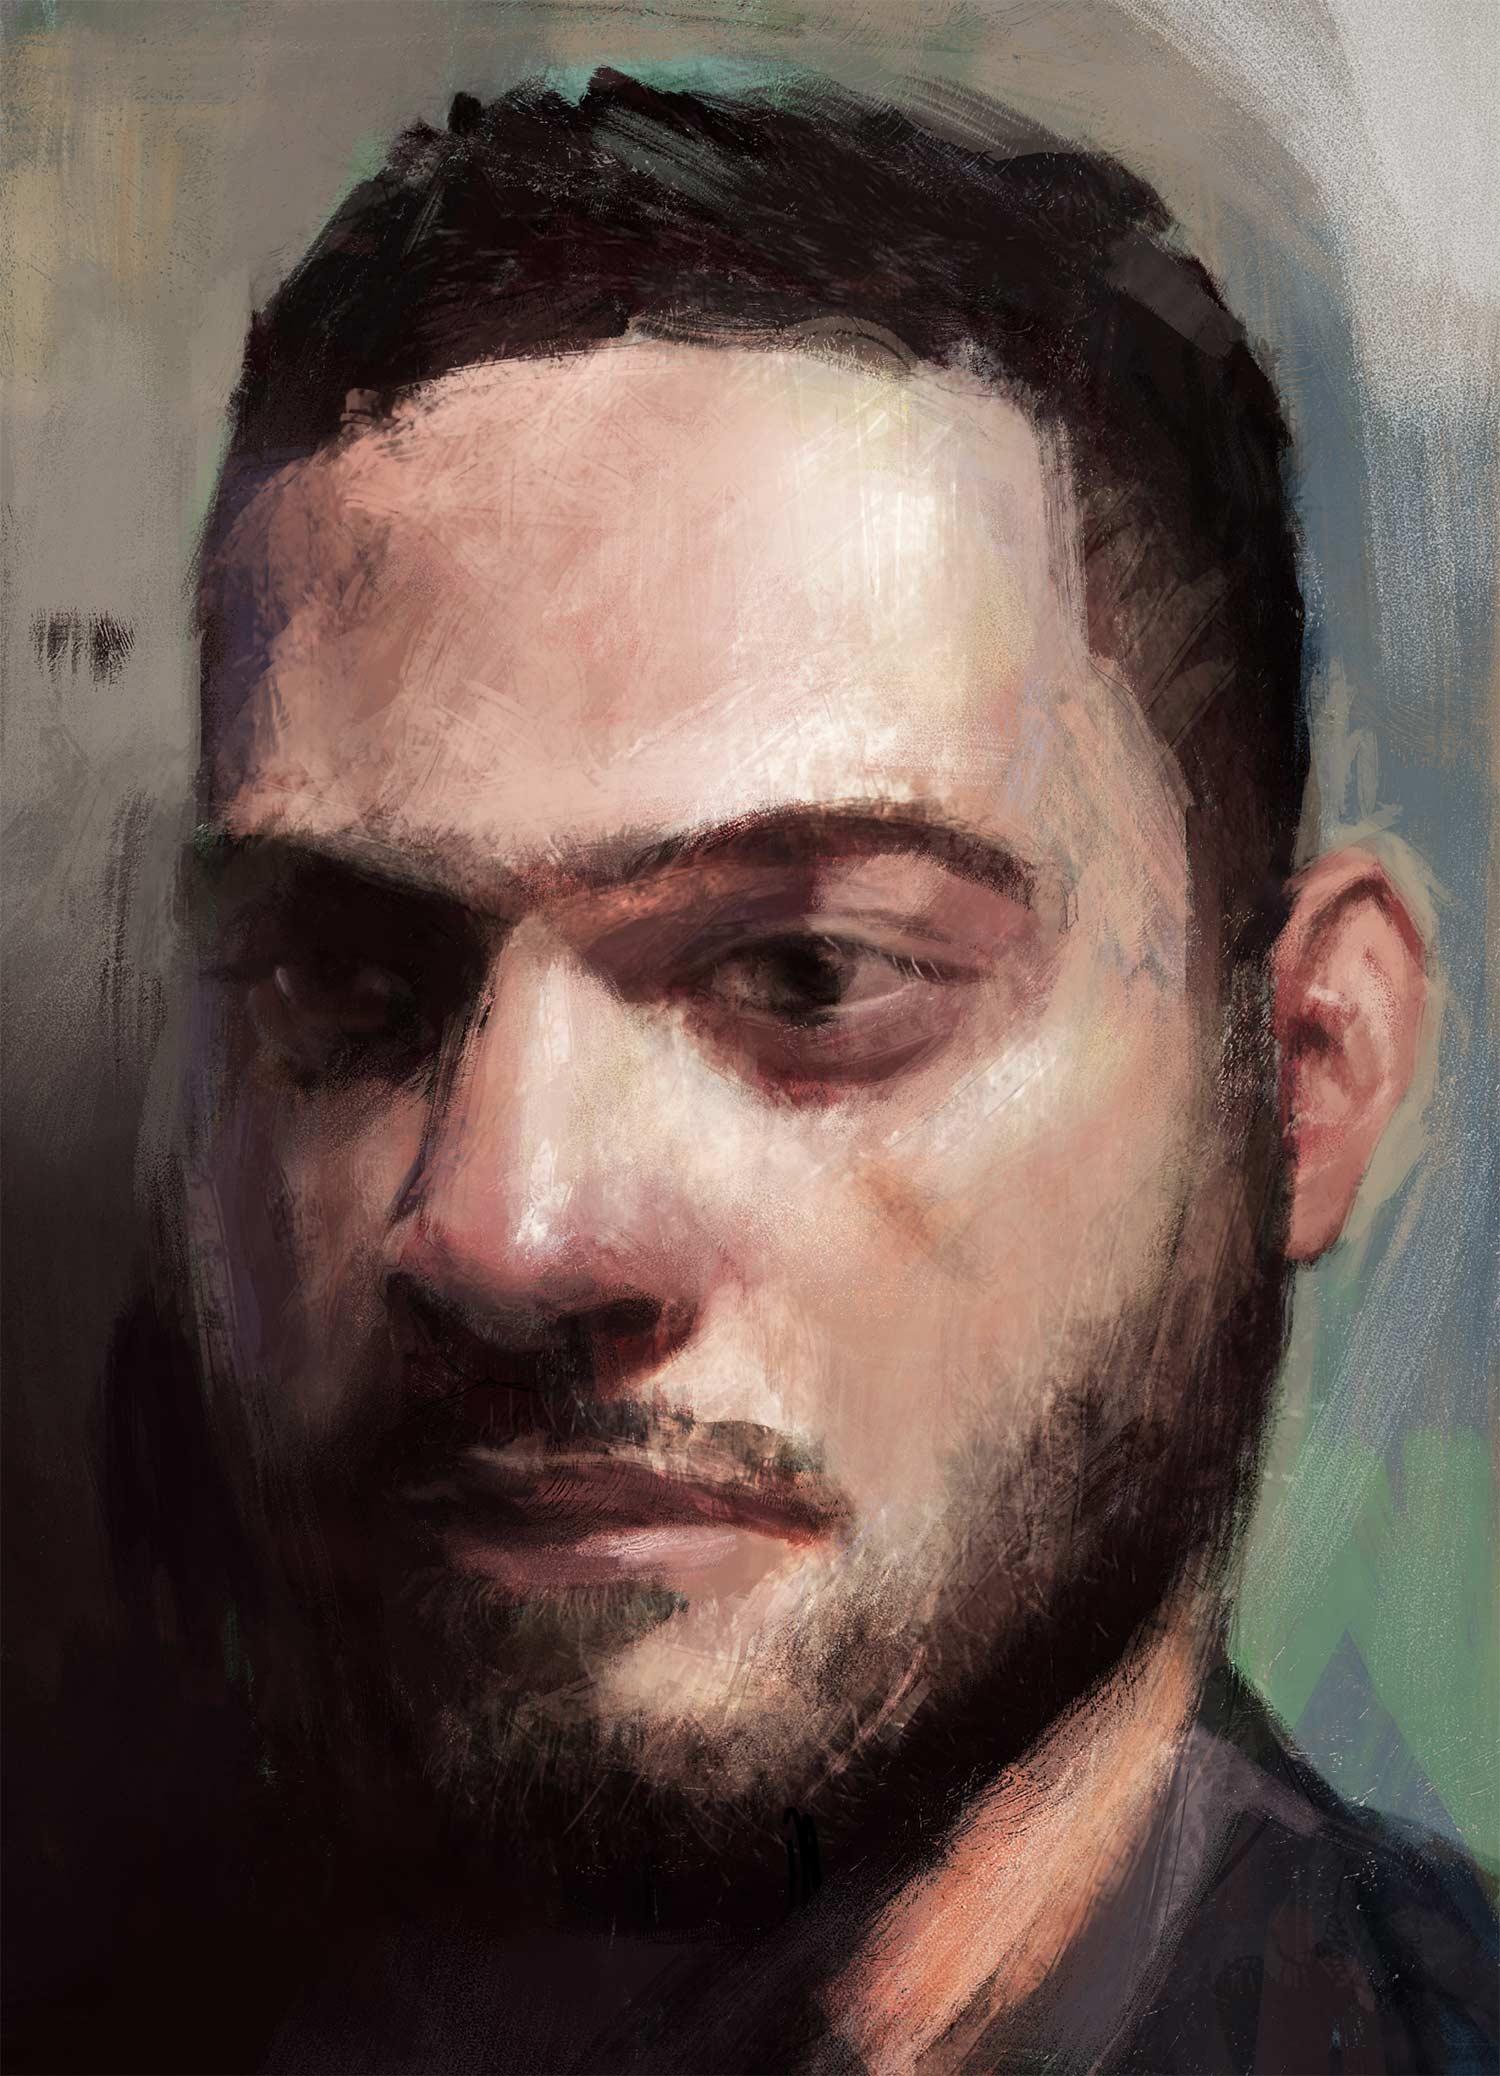 ashcan-digital-course-foundation-digital-painting-works-18-v01-2018-08.jpg